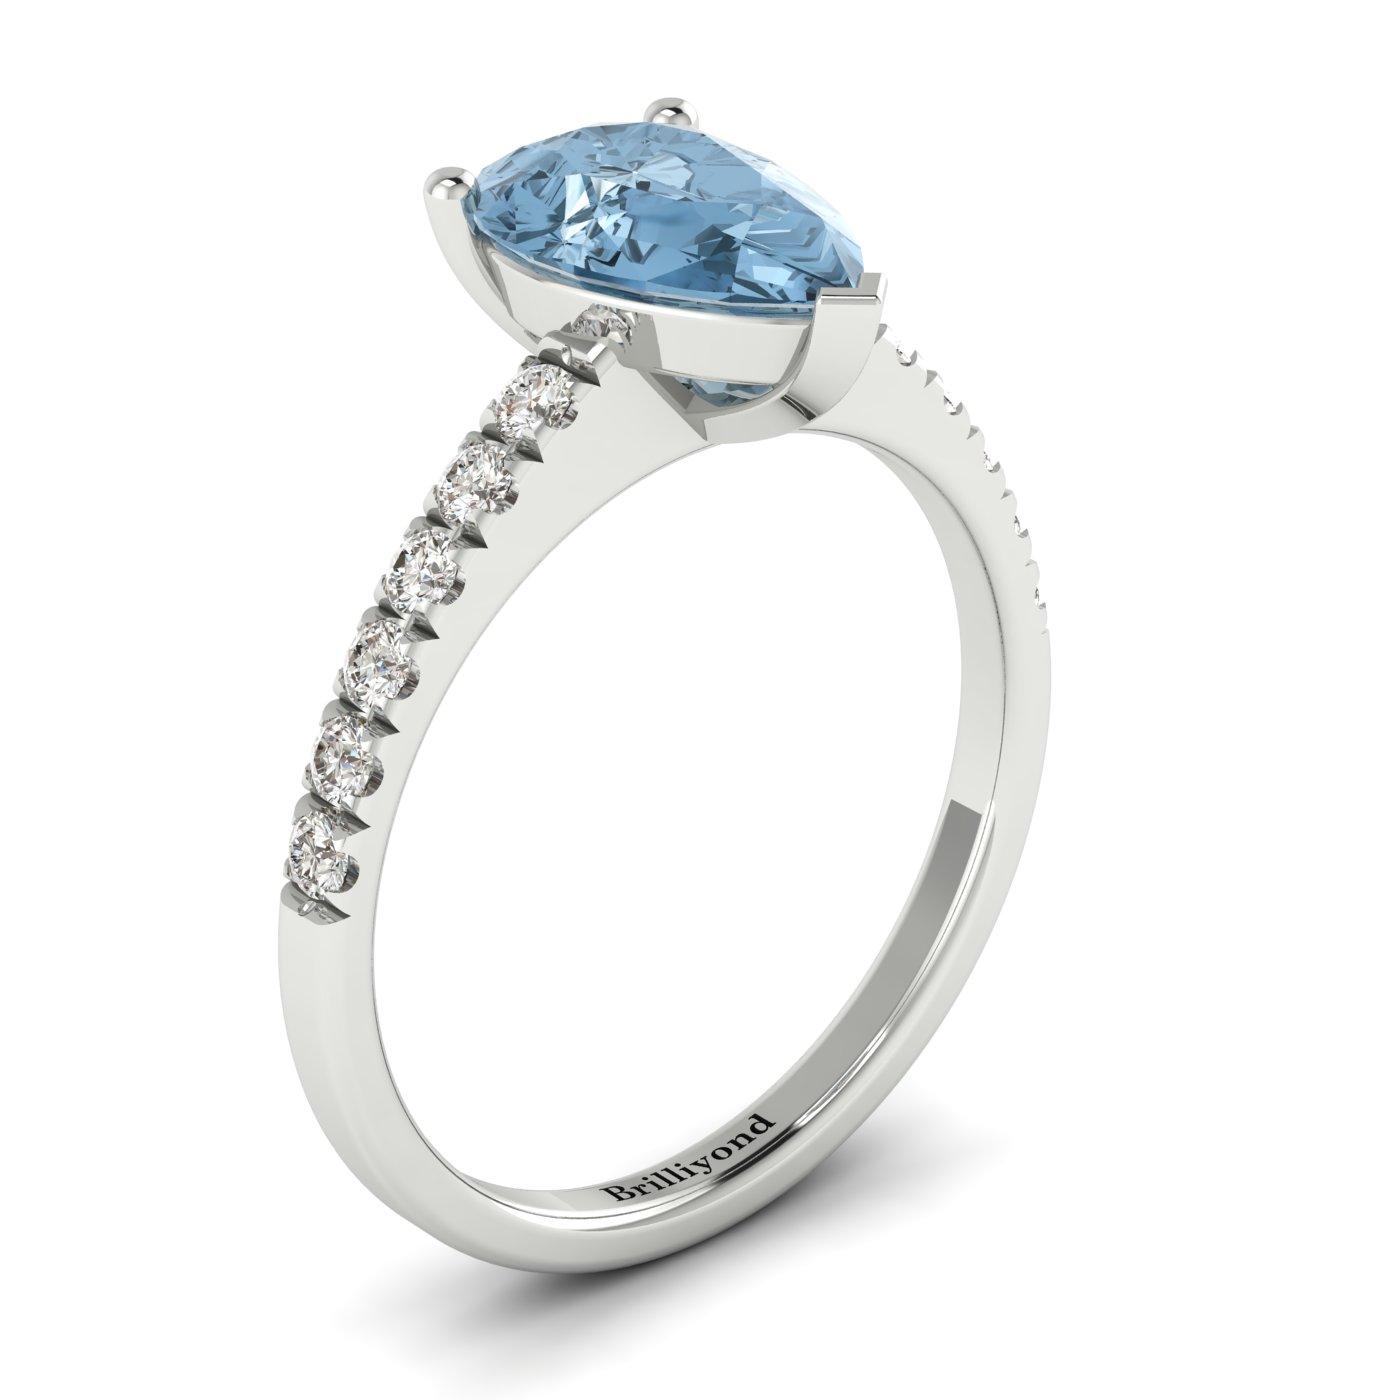 Diamond Accented Natural Aquamarine Solitaire Engagement Ring